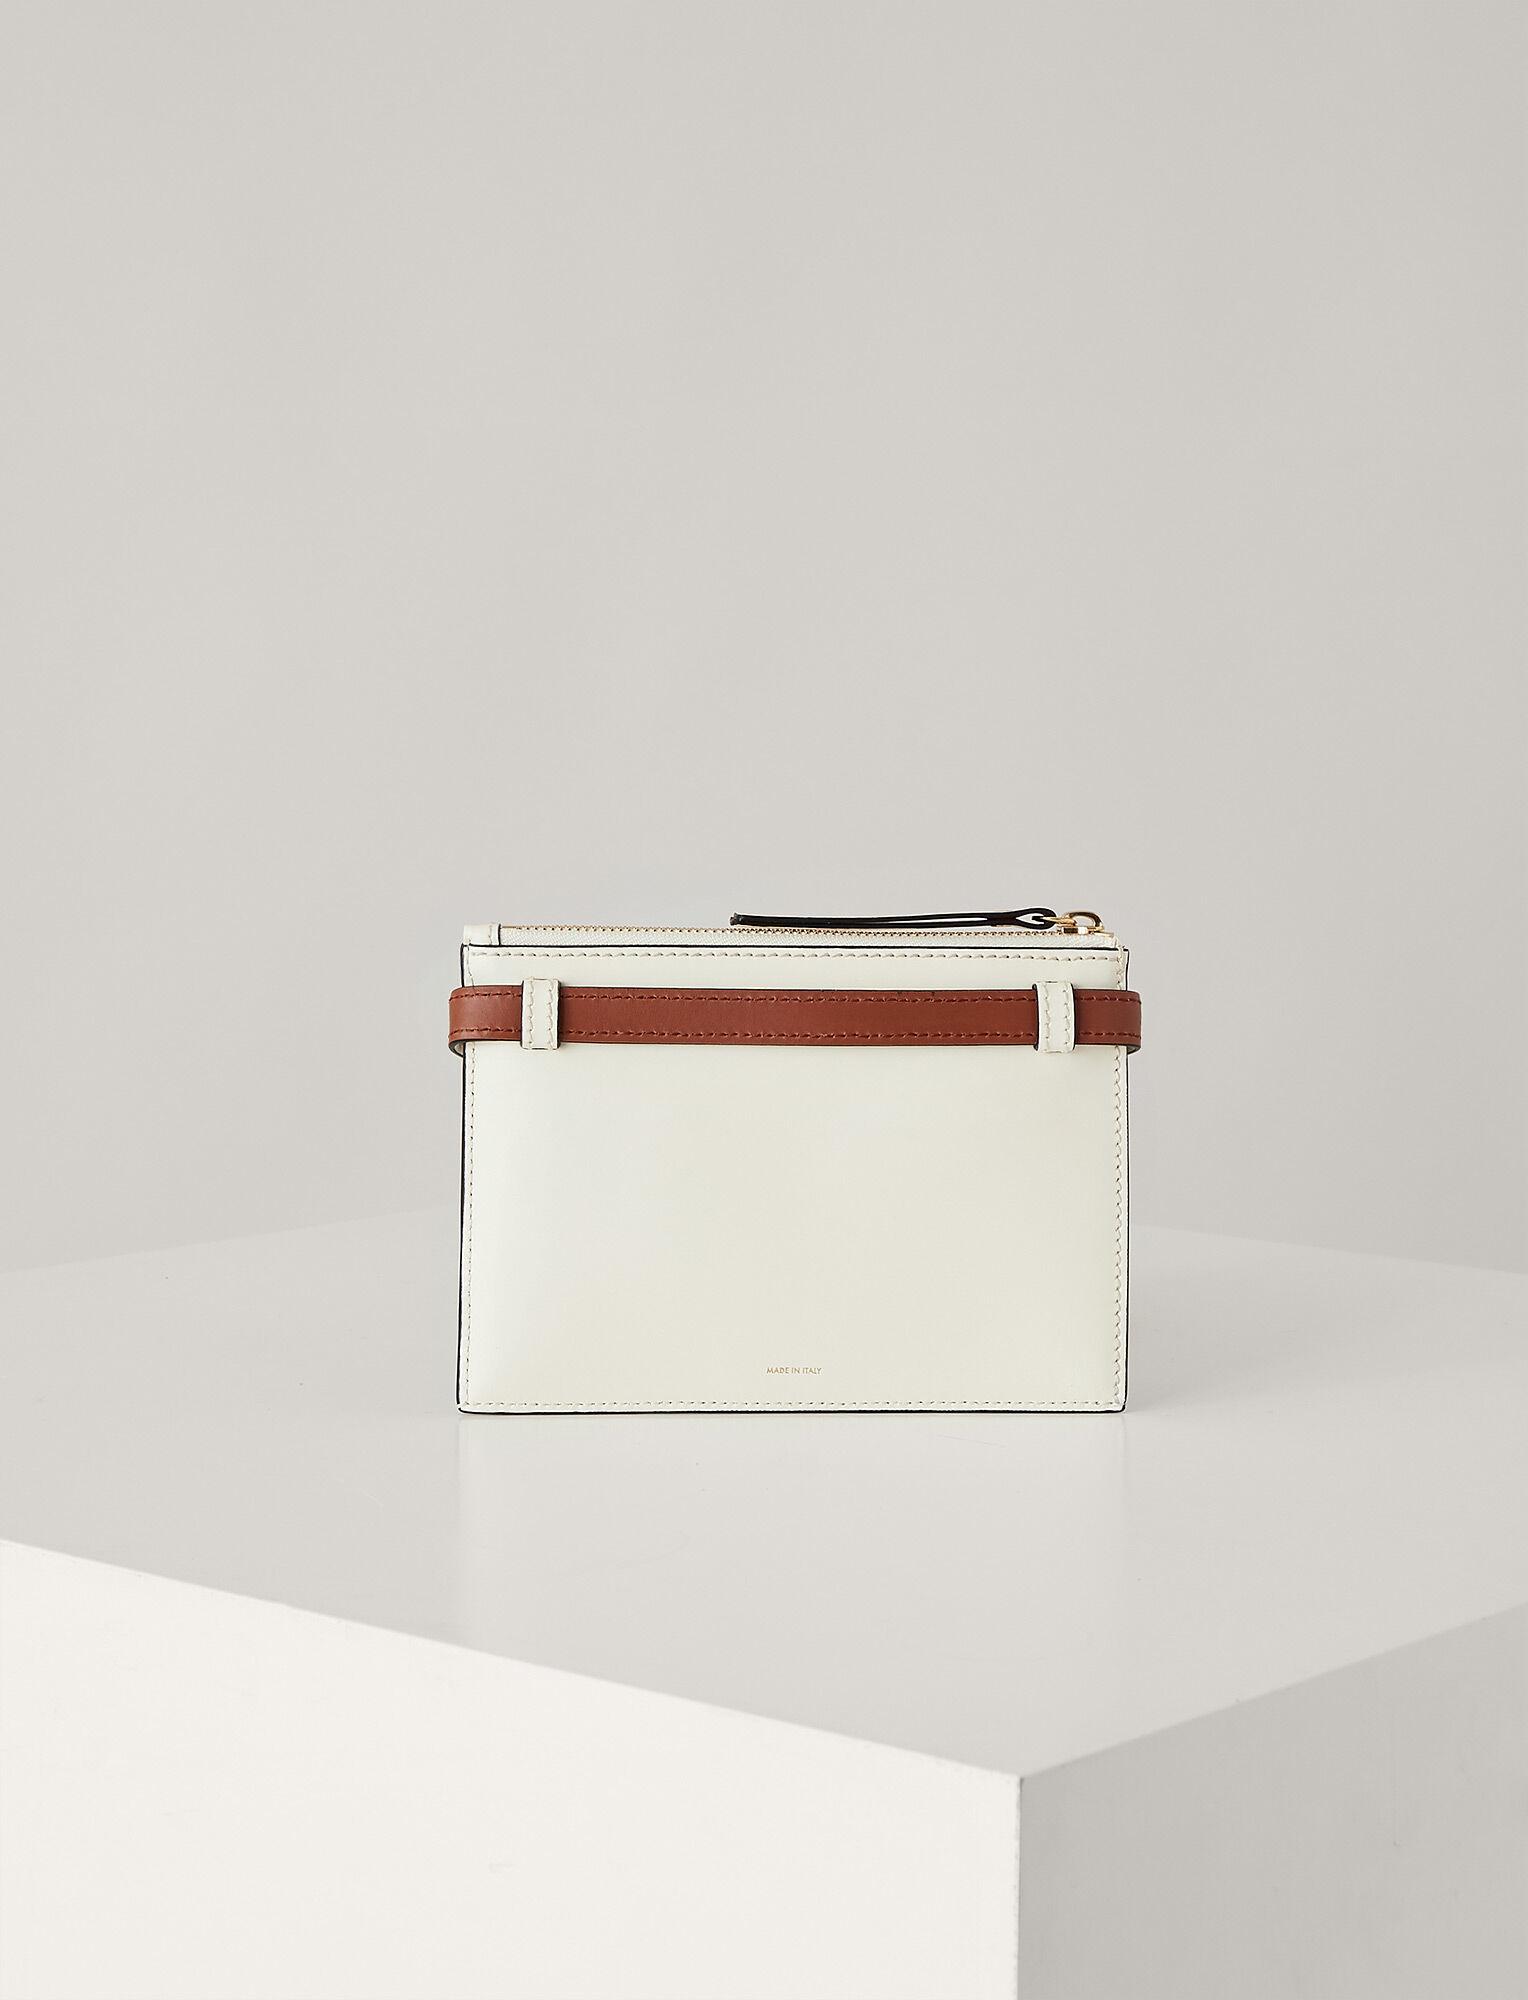 Joseph, Montmartre Leather Bag, in CREAM